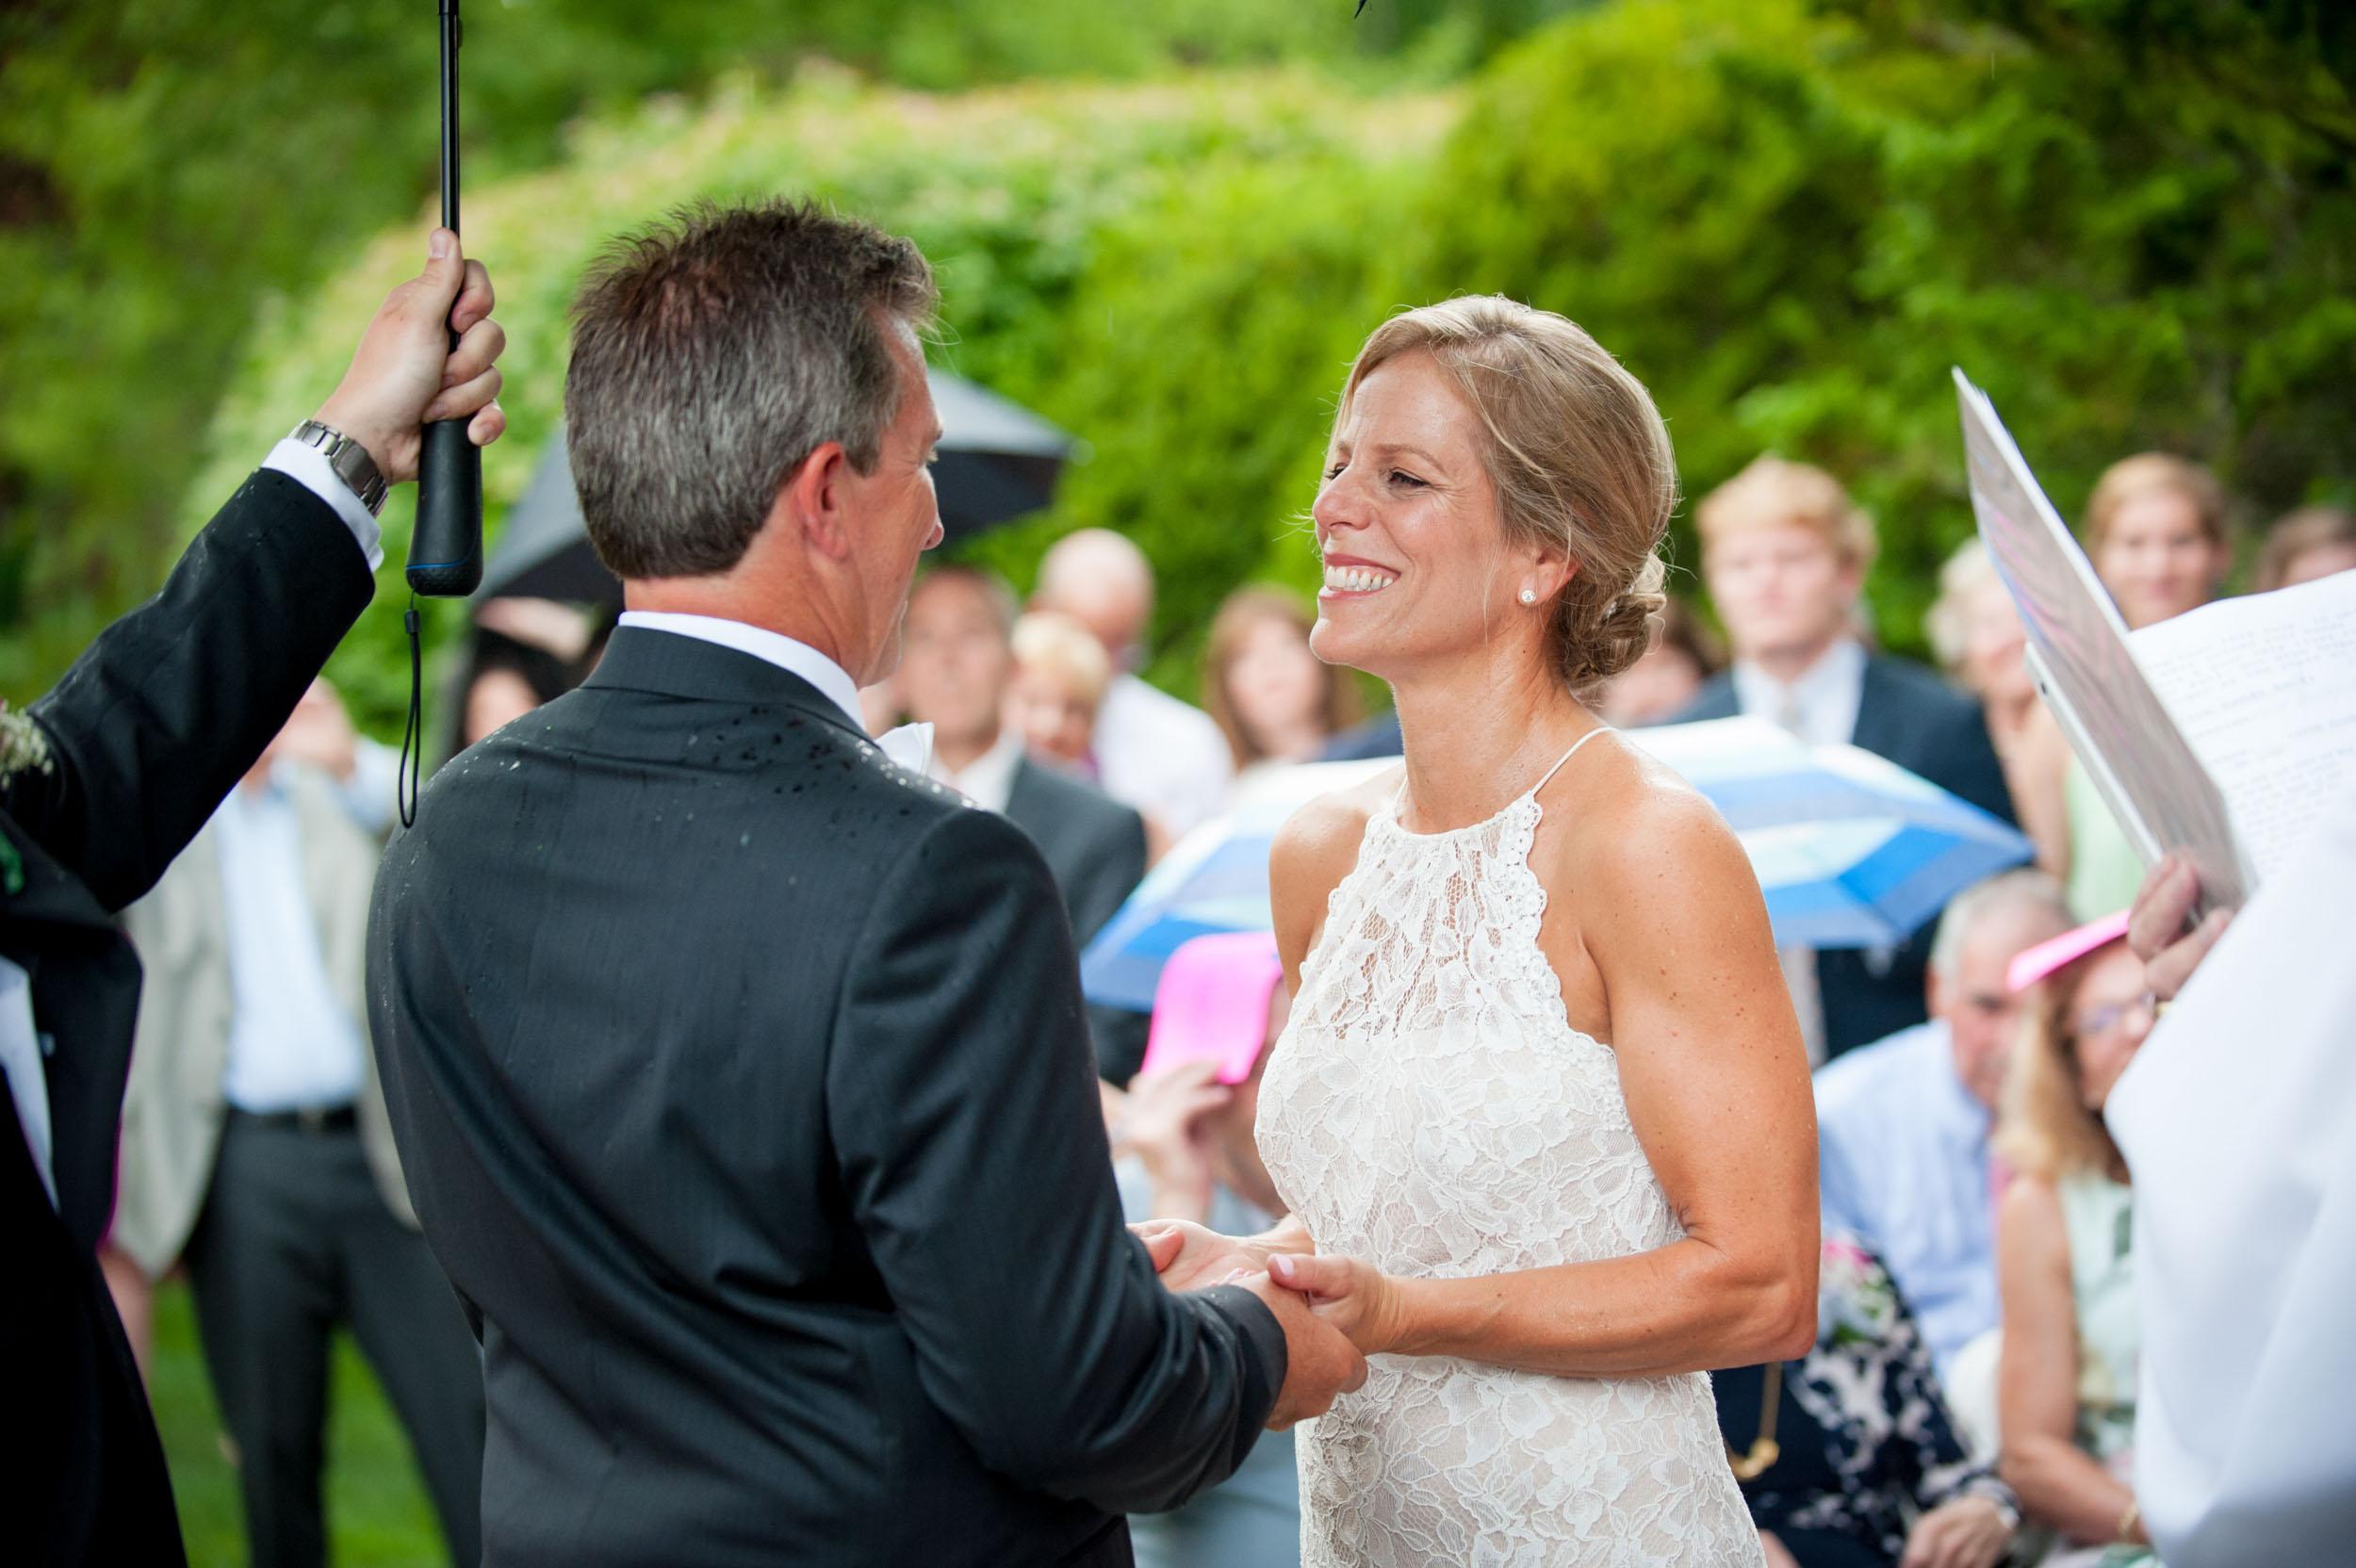 Wedding112PandP 216*2-2.jpg